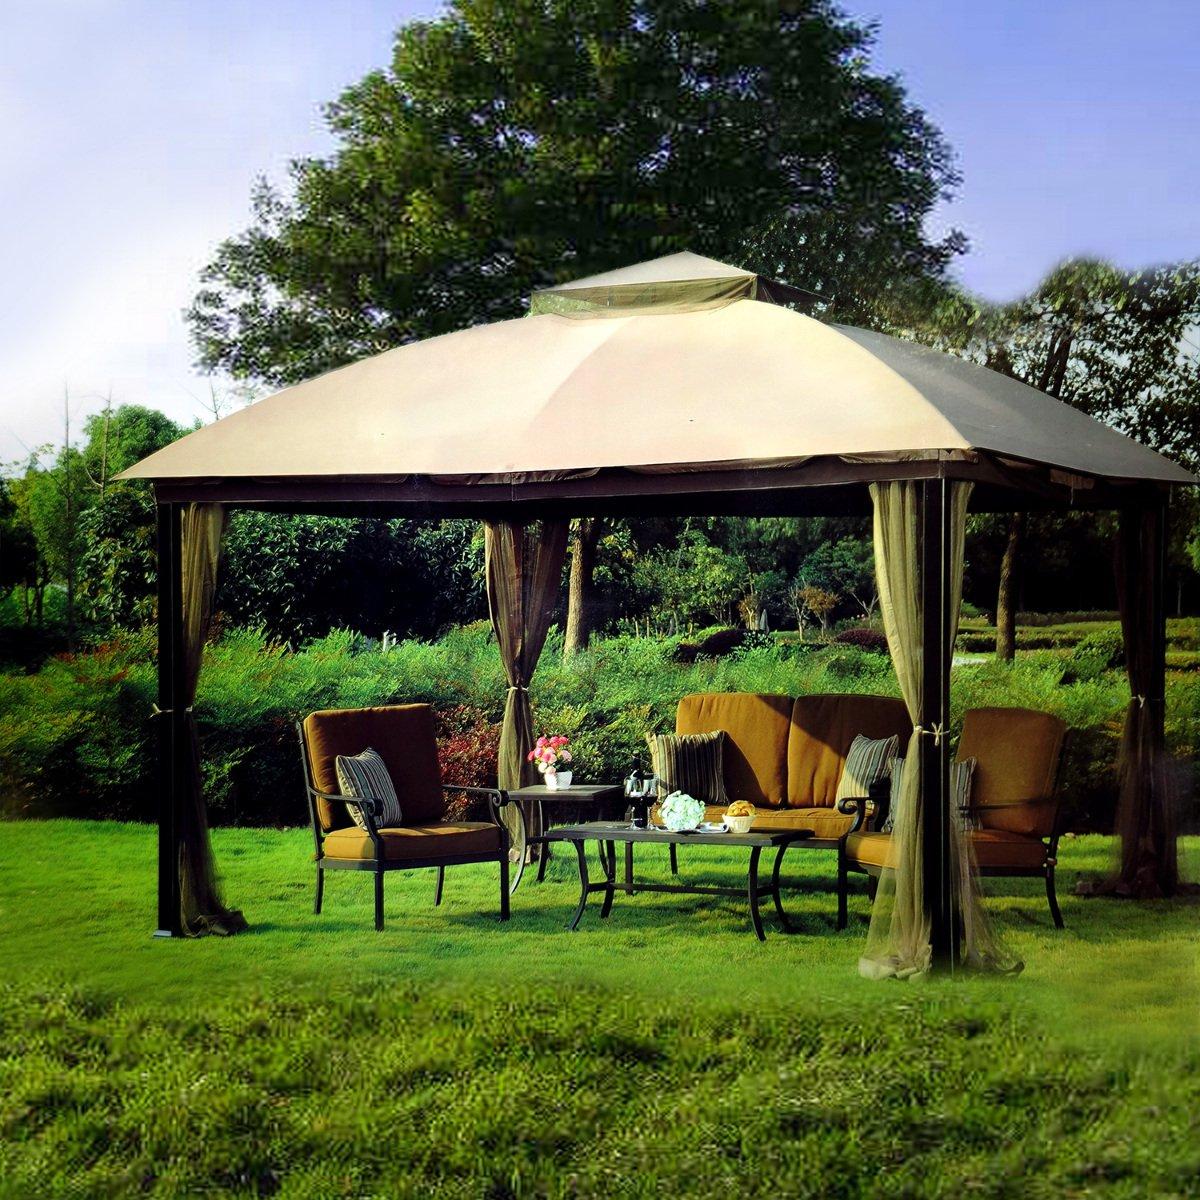 Amazon.com : 10 X 12 Malibu Patio Gazebo With Mosquito Netting : Garden U0026  Outdoor